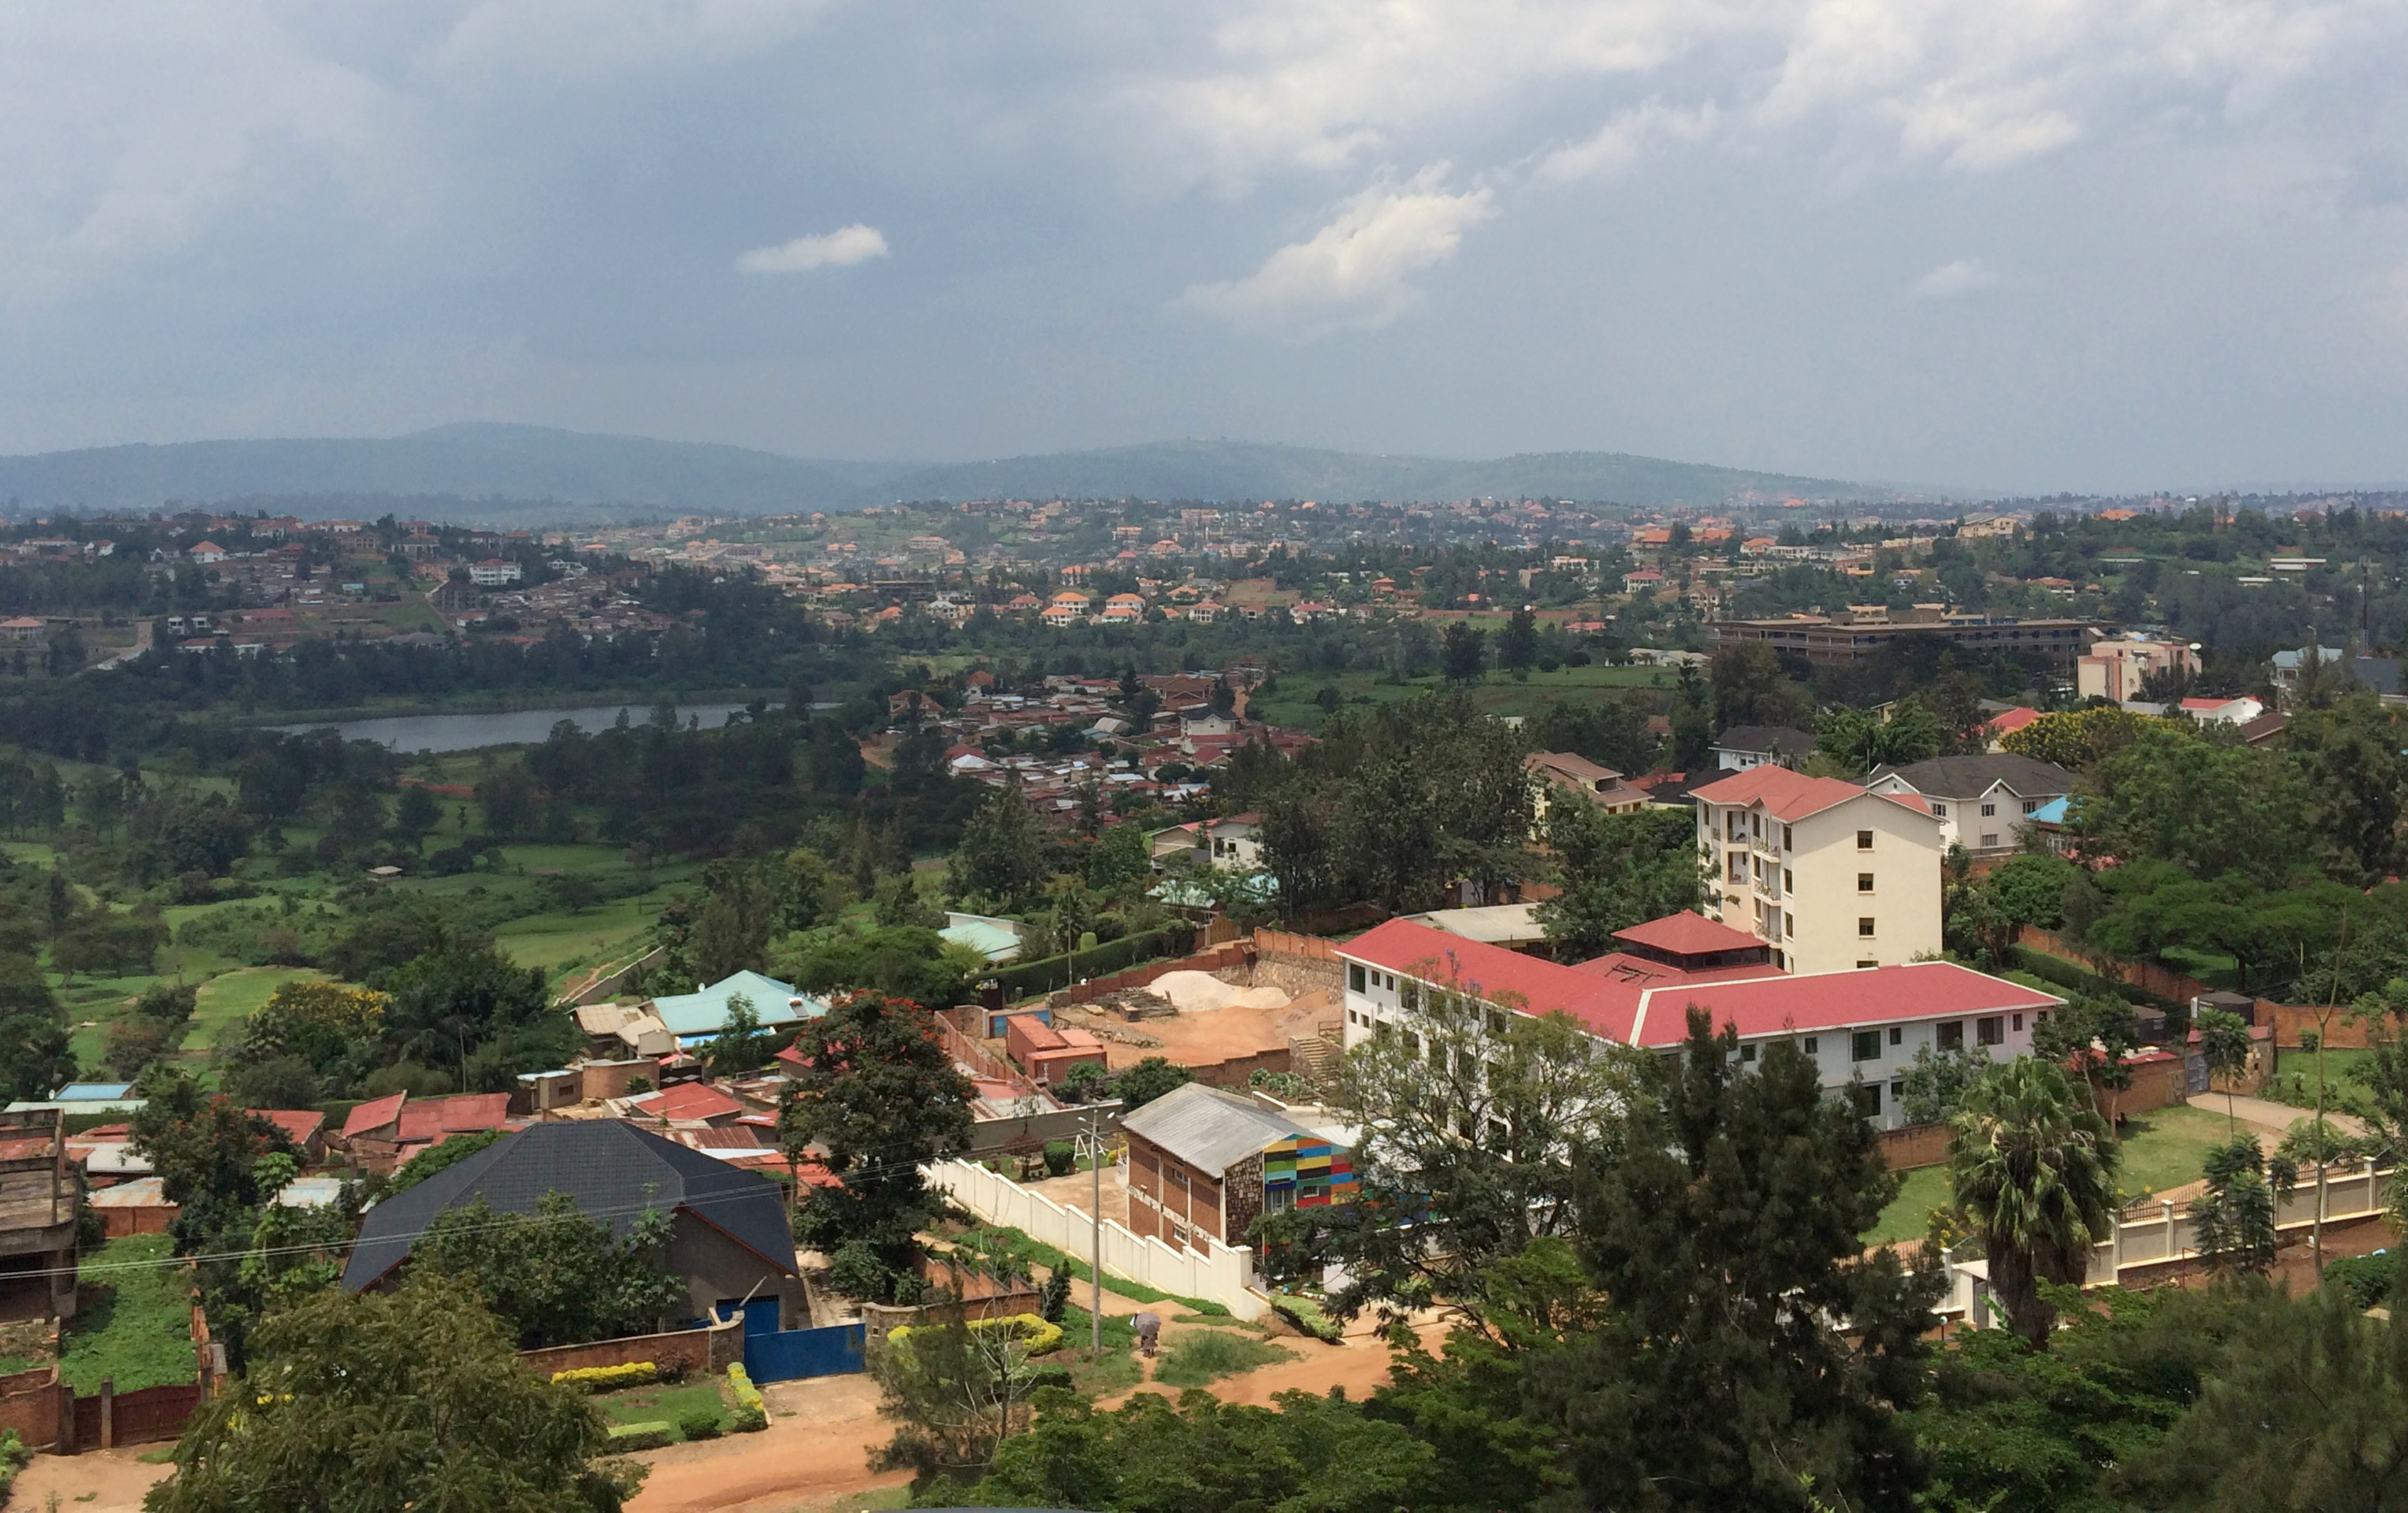 A general view of Rwanda's capital Kigali, March 26, 2014. REUTERS/Edmund Blair